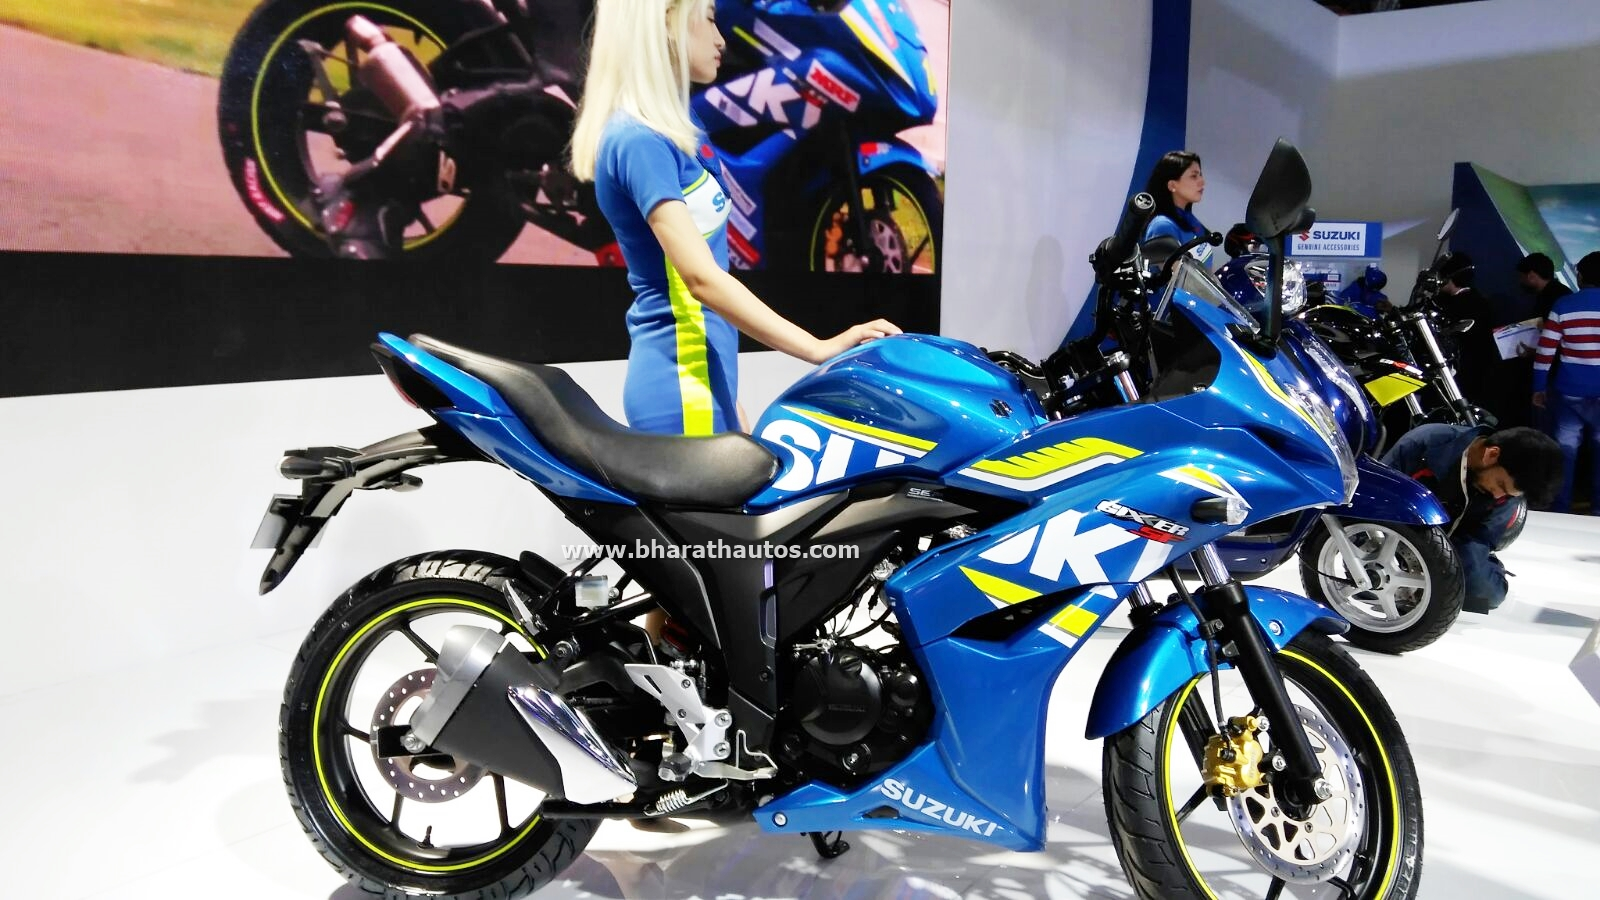 Suzuki quadsport z400 reviews prices and specs autos weblog suzuki - Suzuki Gixxer Sf Rear Disc Brake 2016 Auto